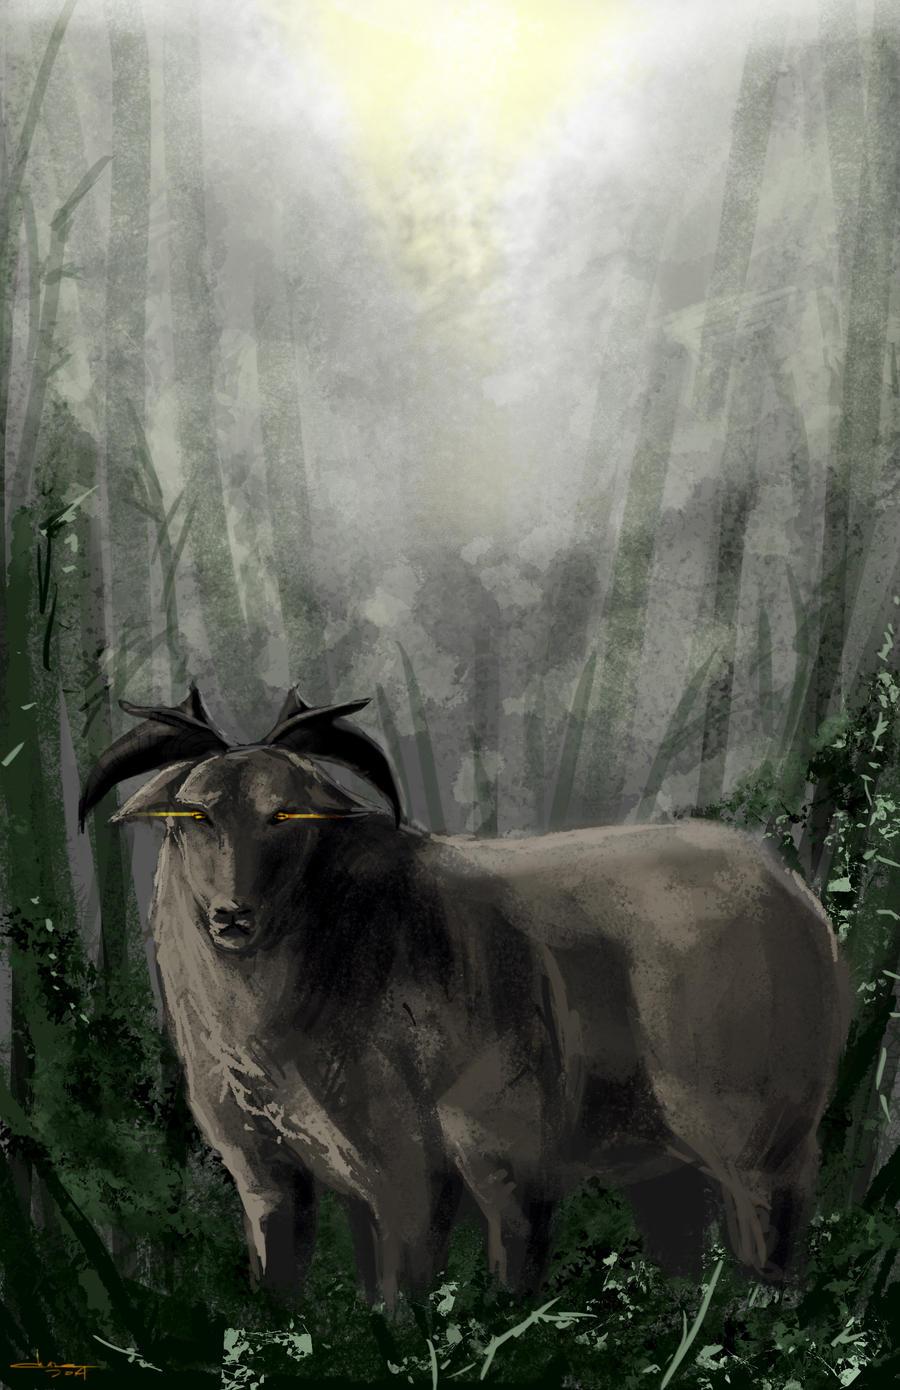 Shleipnir by putridCheese